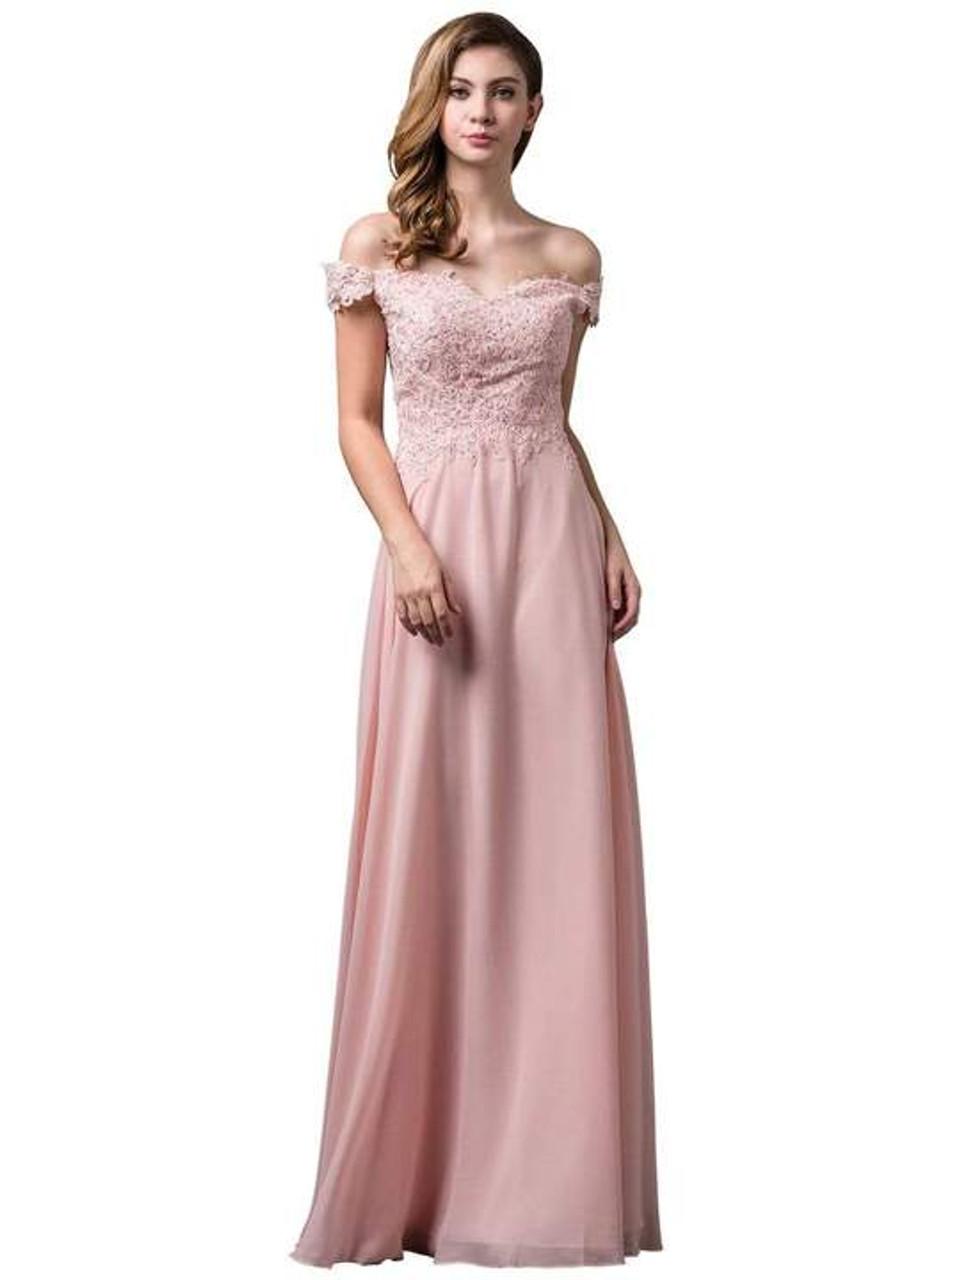 Dancing Queen 2492 Off Shoulder Lace Applique Long Dress